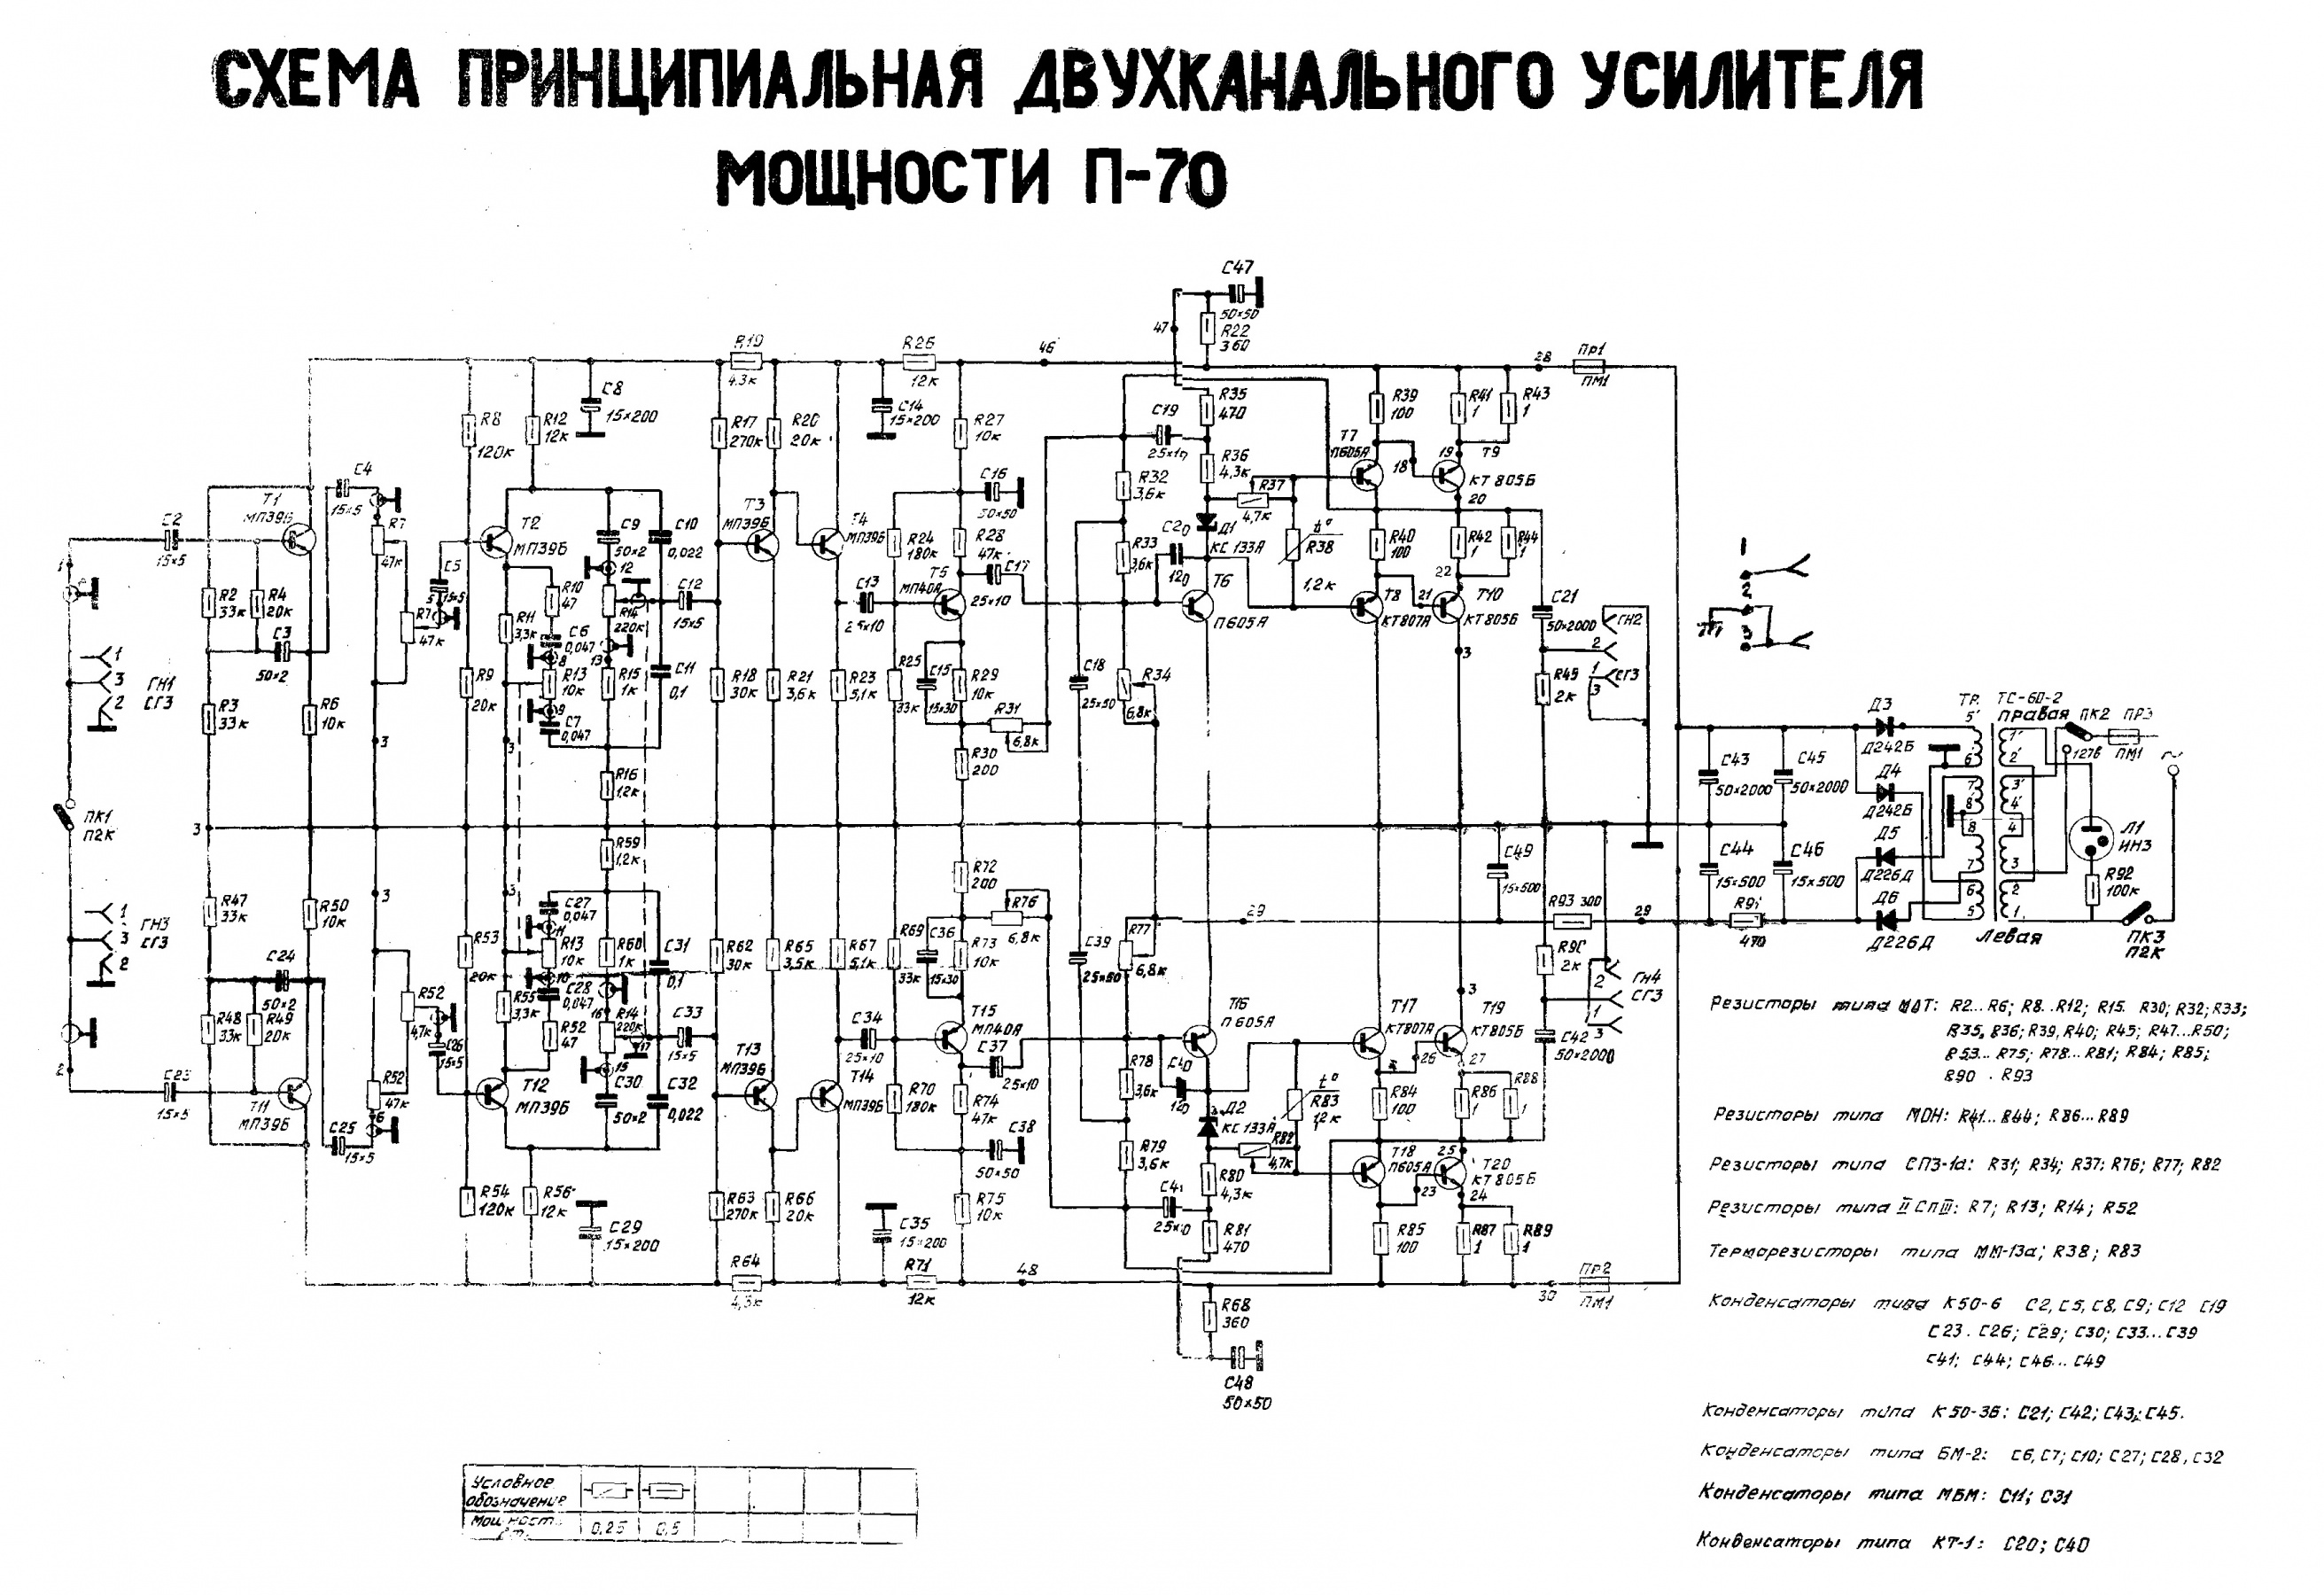 Кас 500 схема и документация